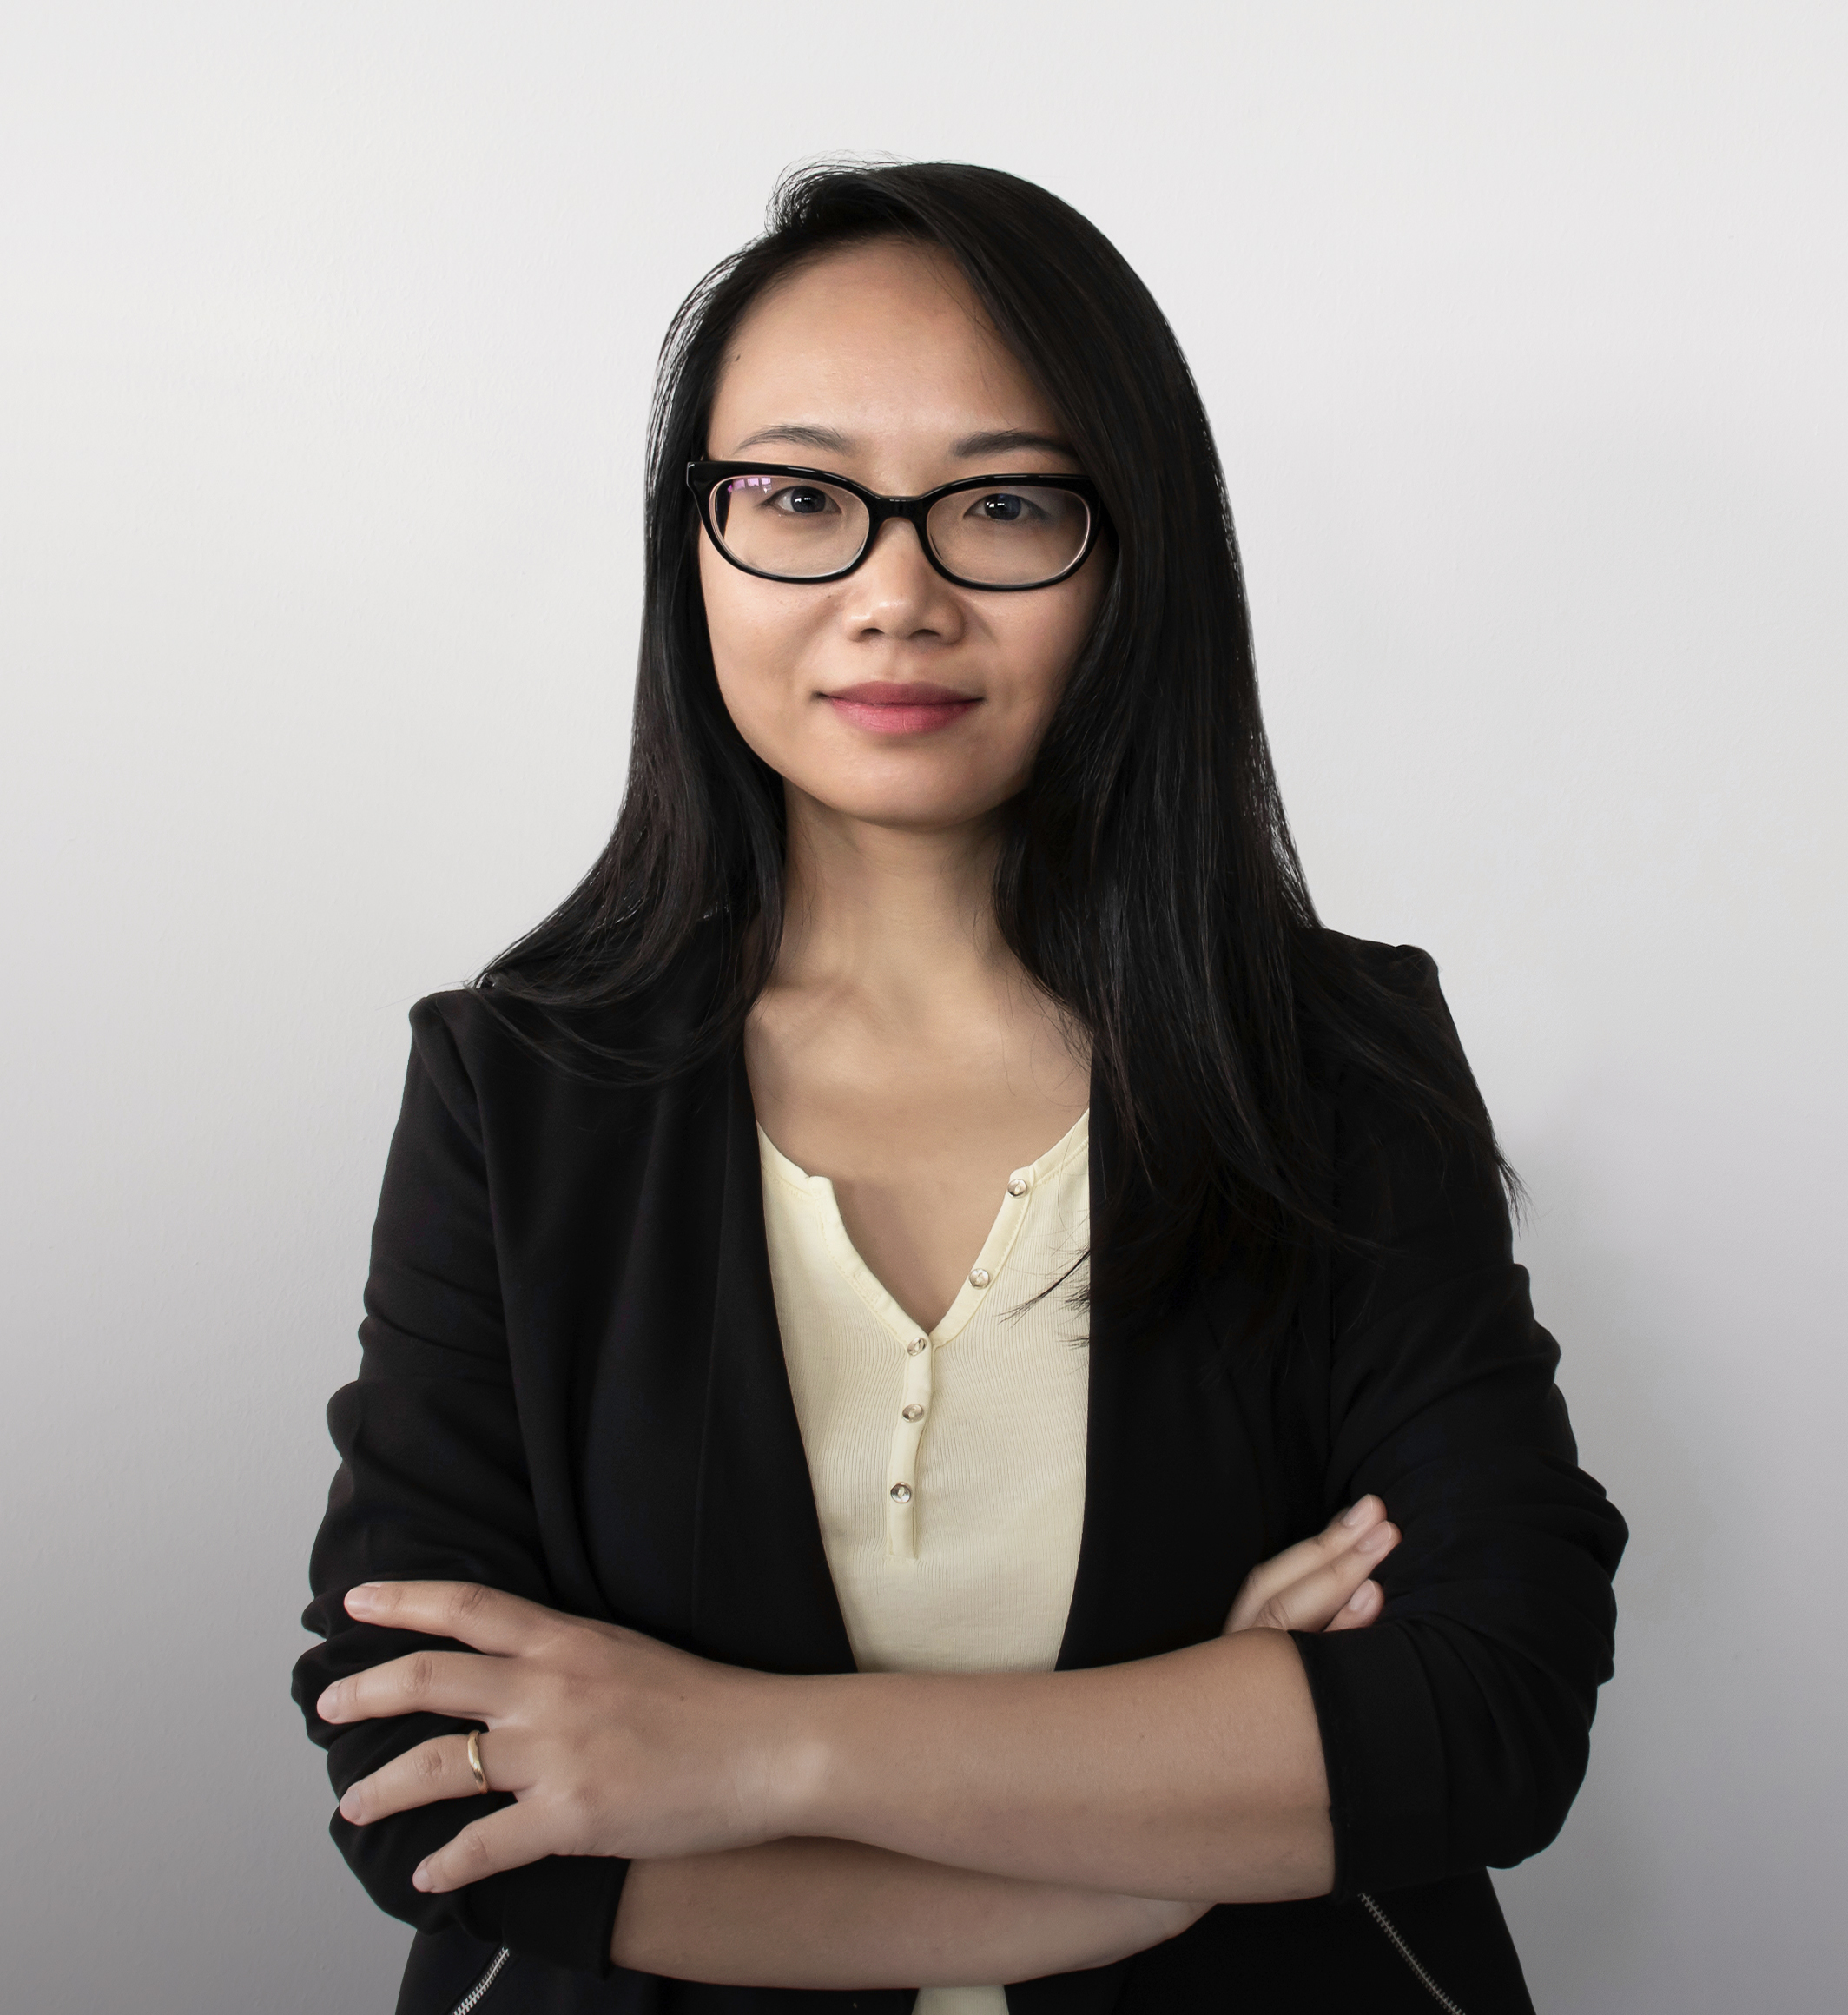 Yanhui Yang